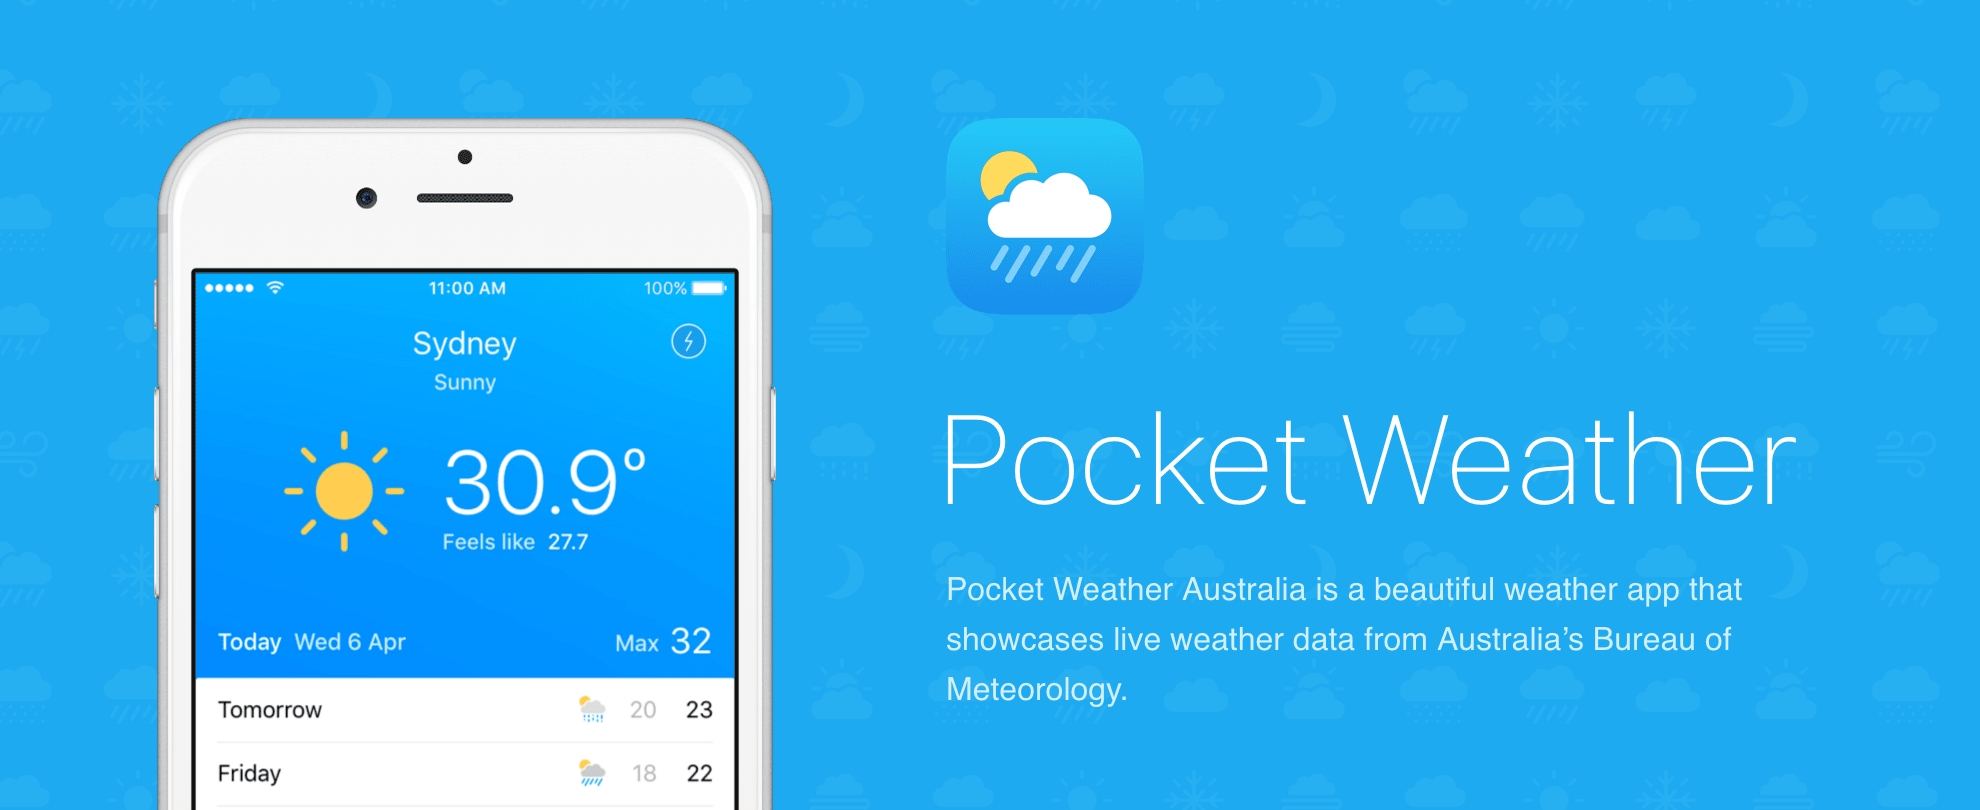 澳洲實用App : Pocket Weather